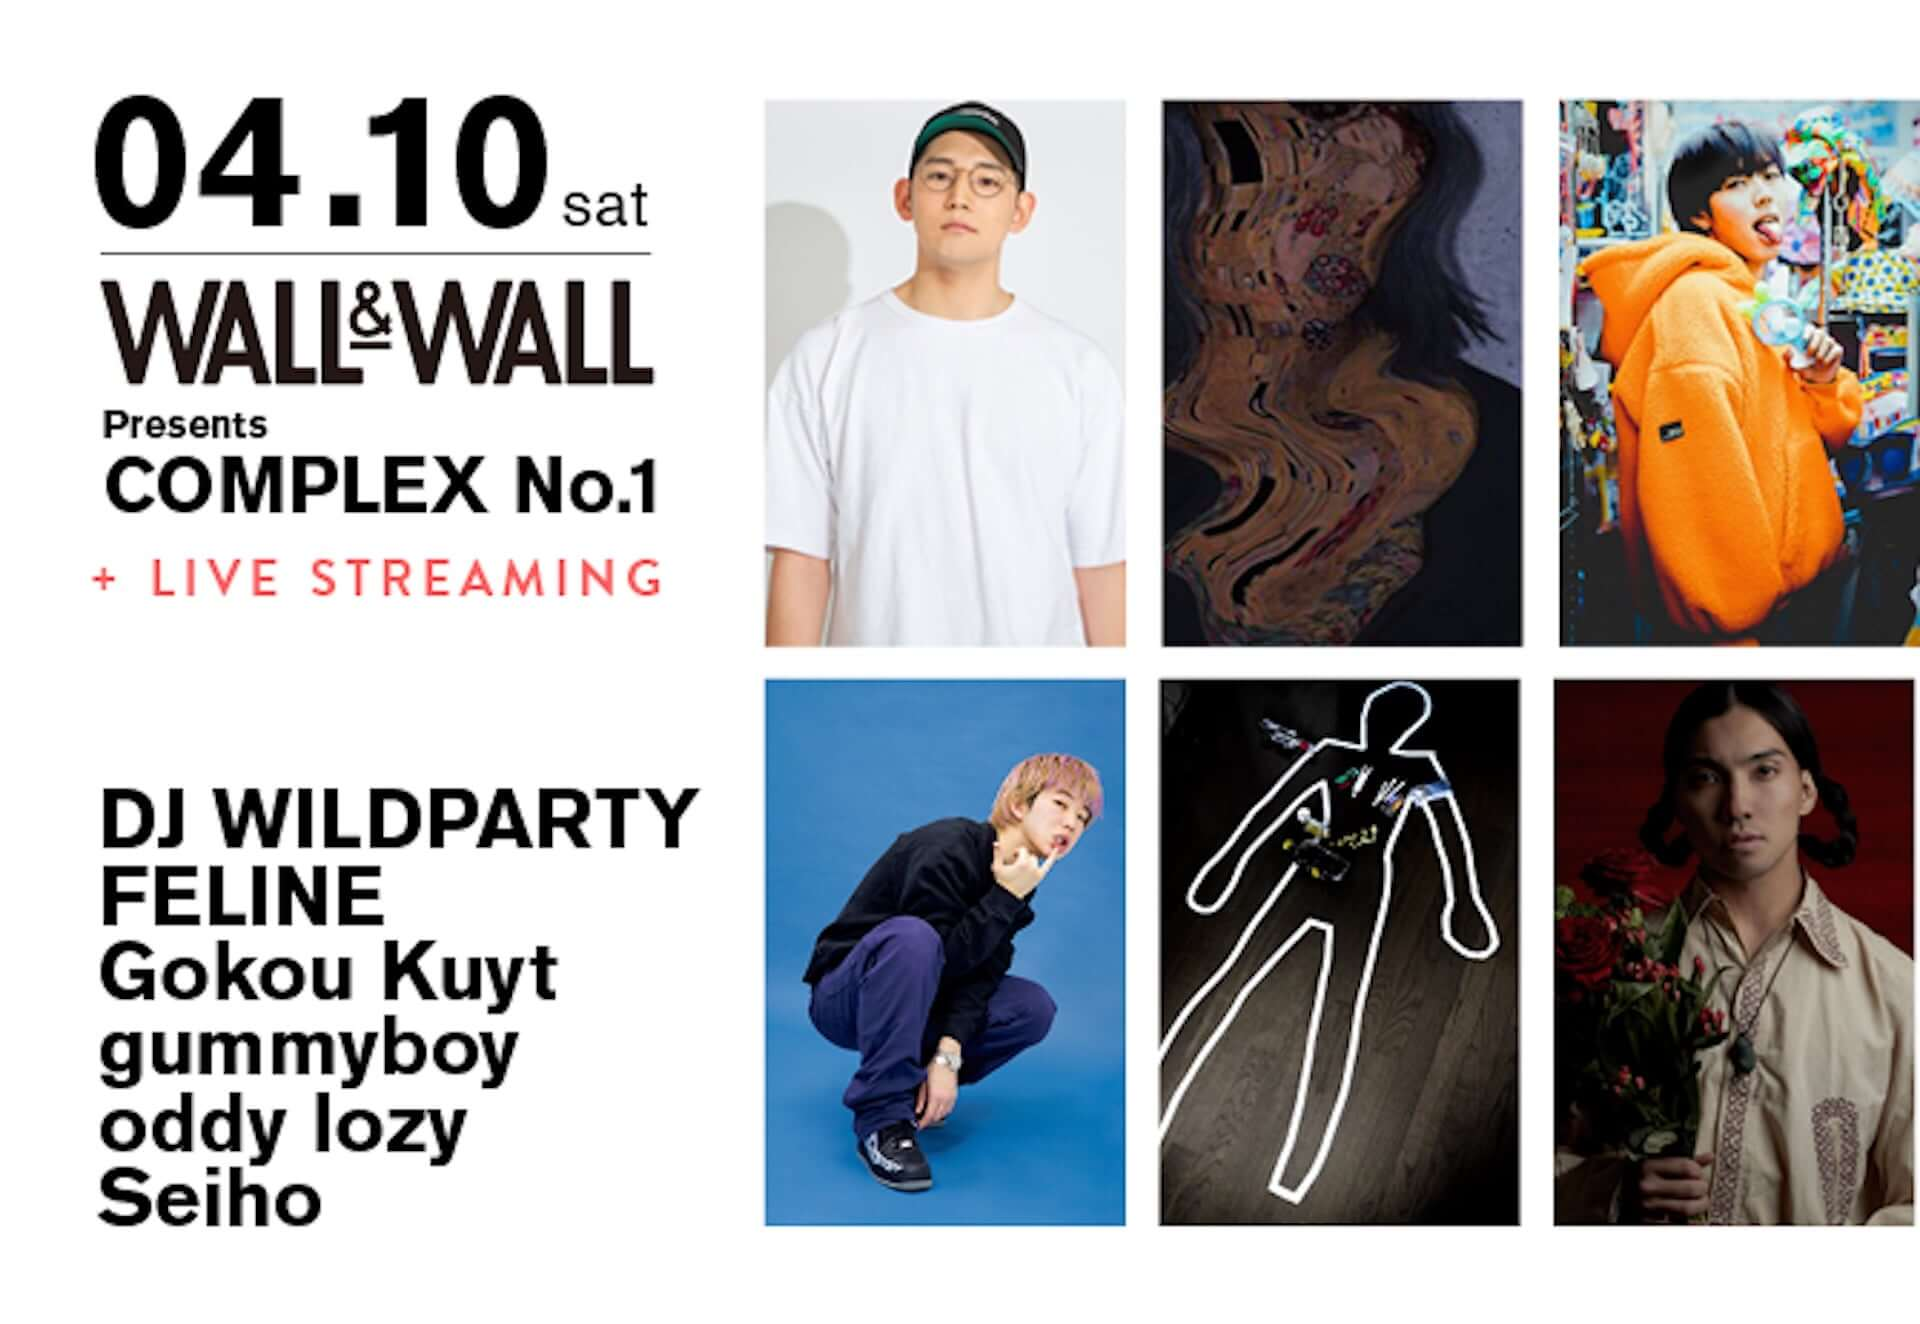 Seiho、gummyboy、Gokou Kuyt、DJ WILDPARTYらが集結!表参道WALL&WALLで新パーティー<COMPLEX No.1>が開催決定 music210326_complexno1_7-1920x1324